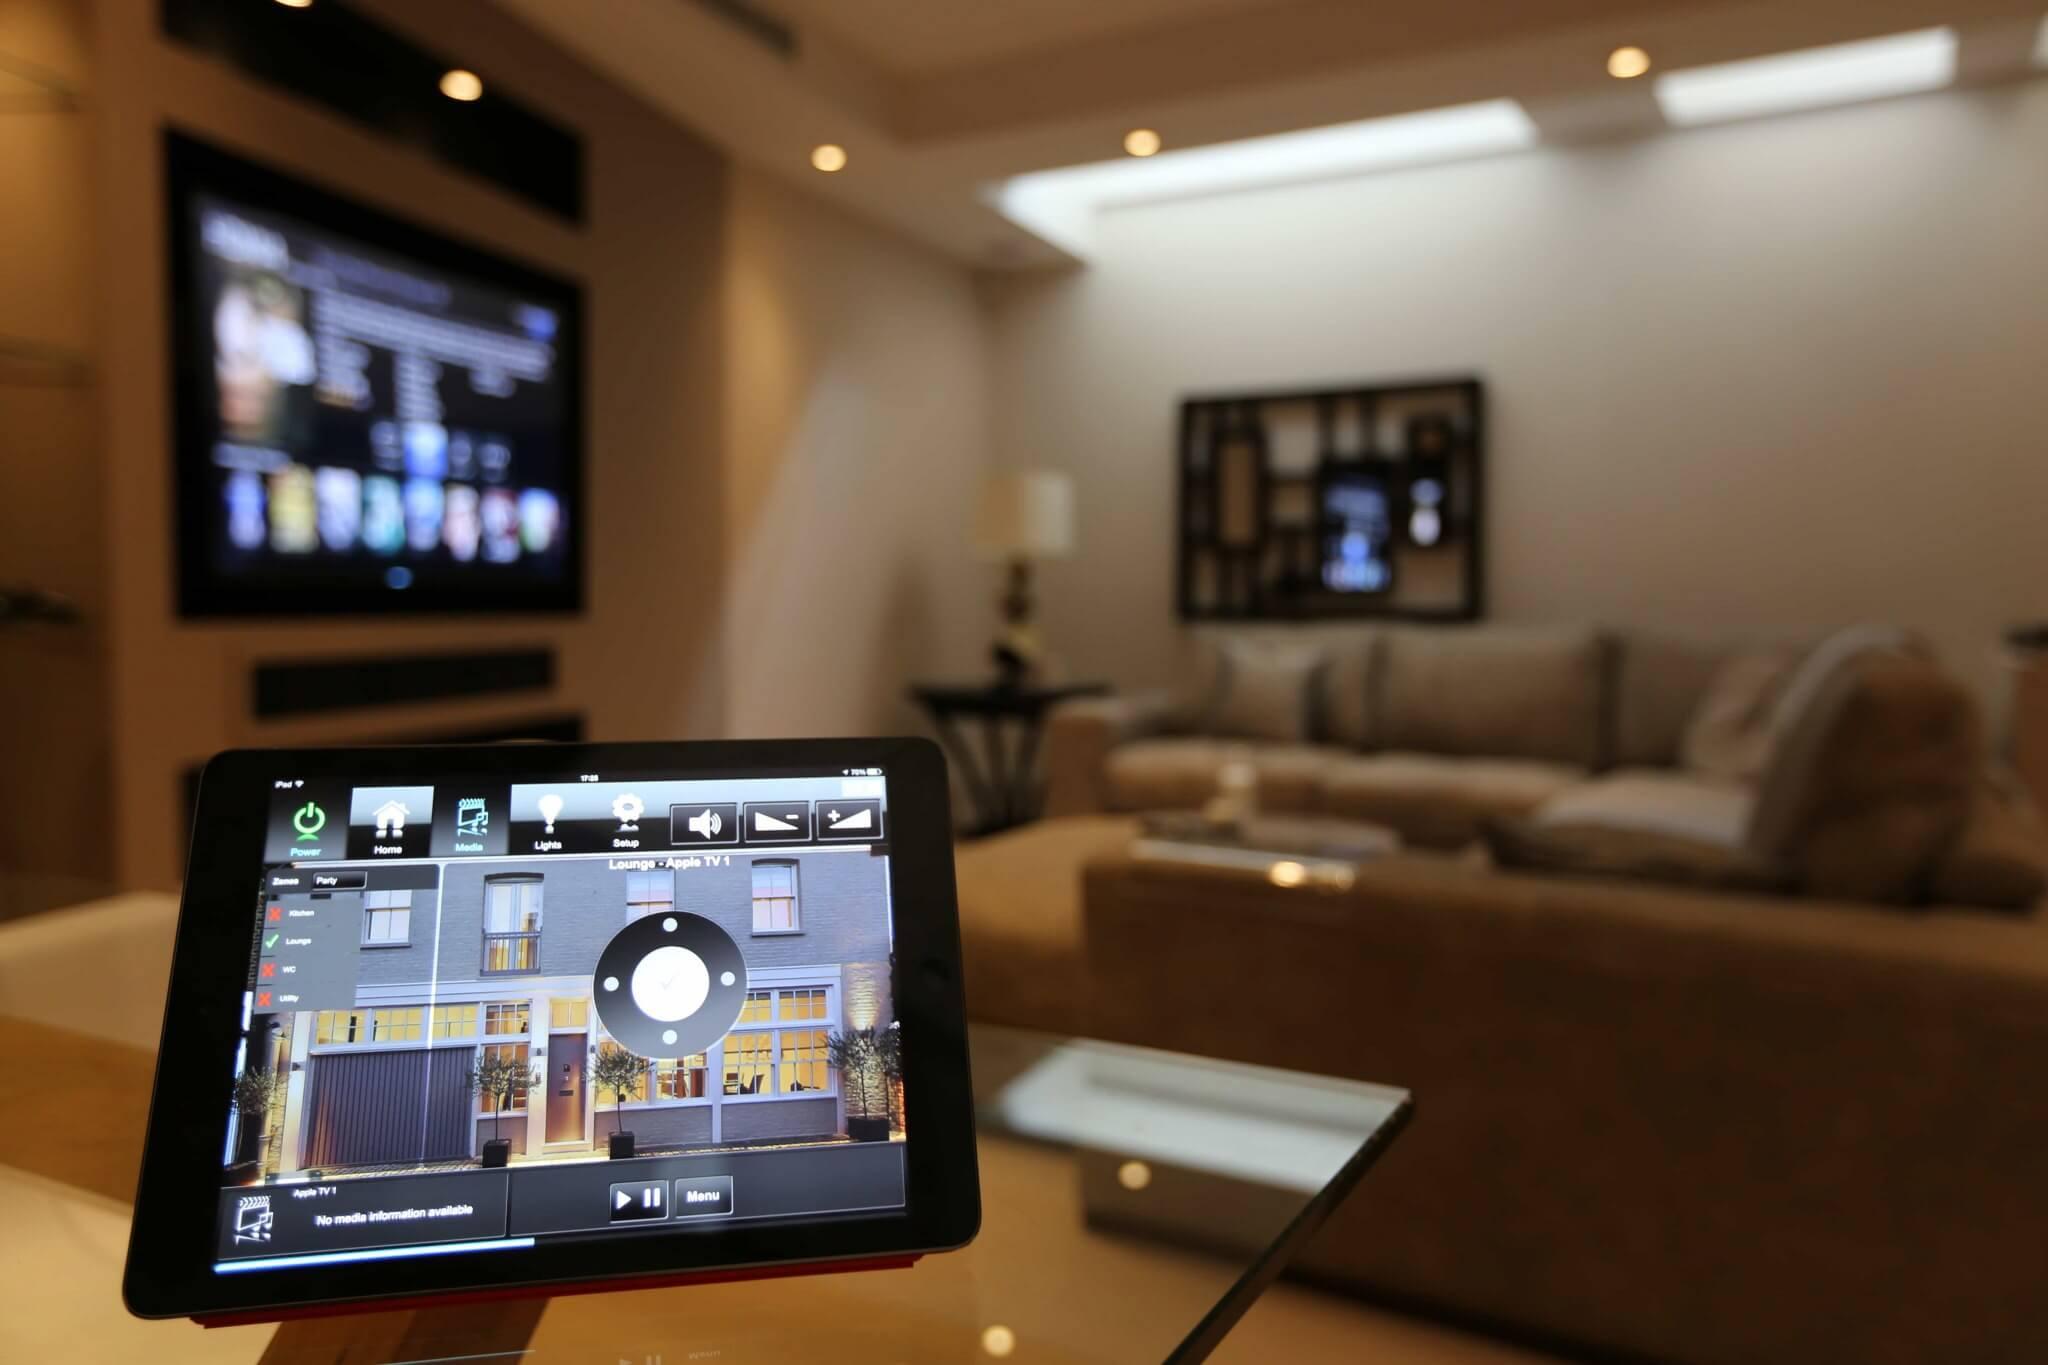 Crestron Smart Home Control via iPad